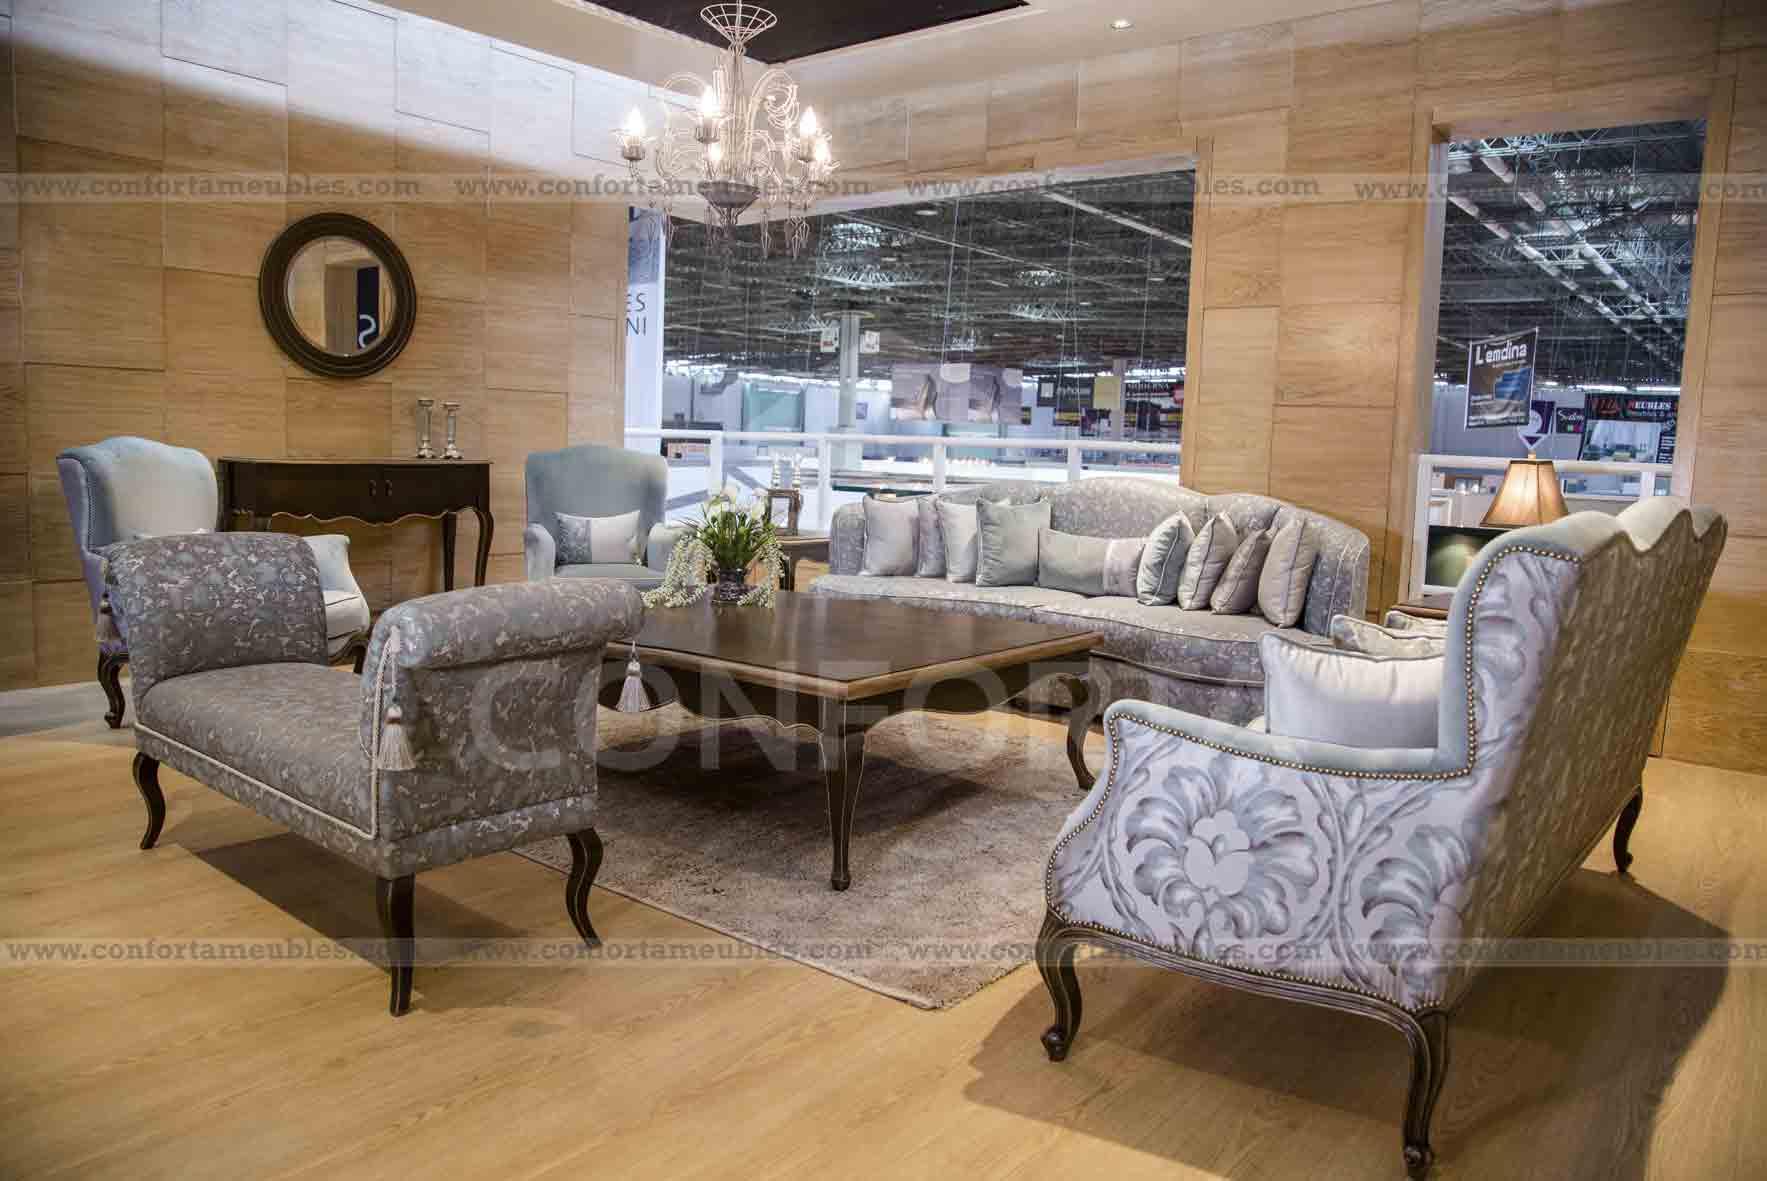 salons tunisie meubles et d coration tunisie. Black Bedroom Furniture Sets. Home Design Ideas